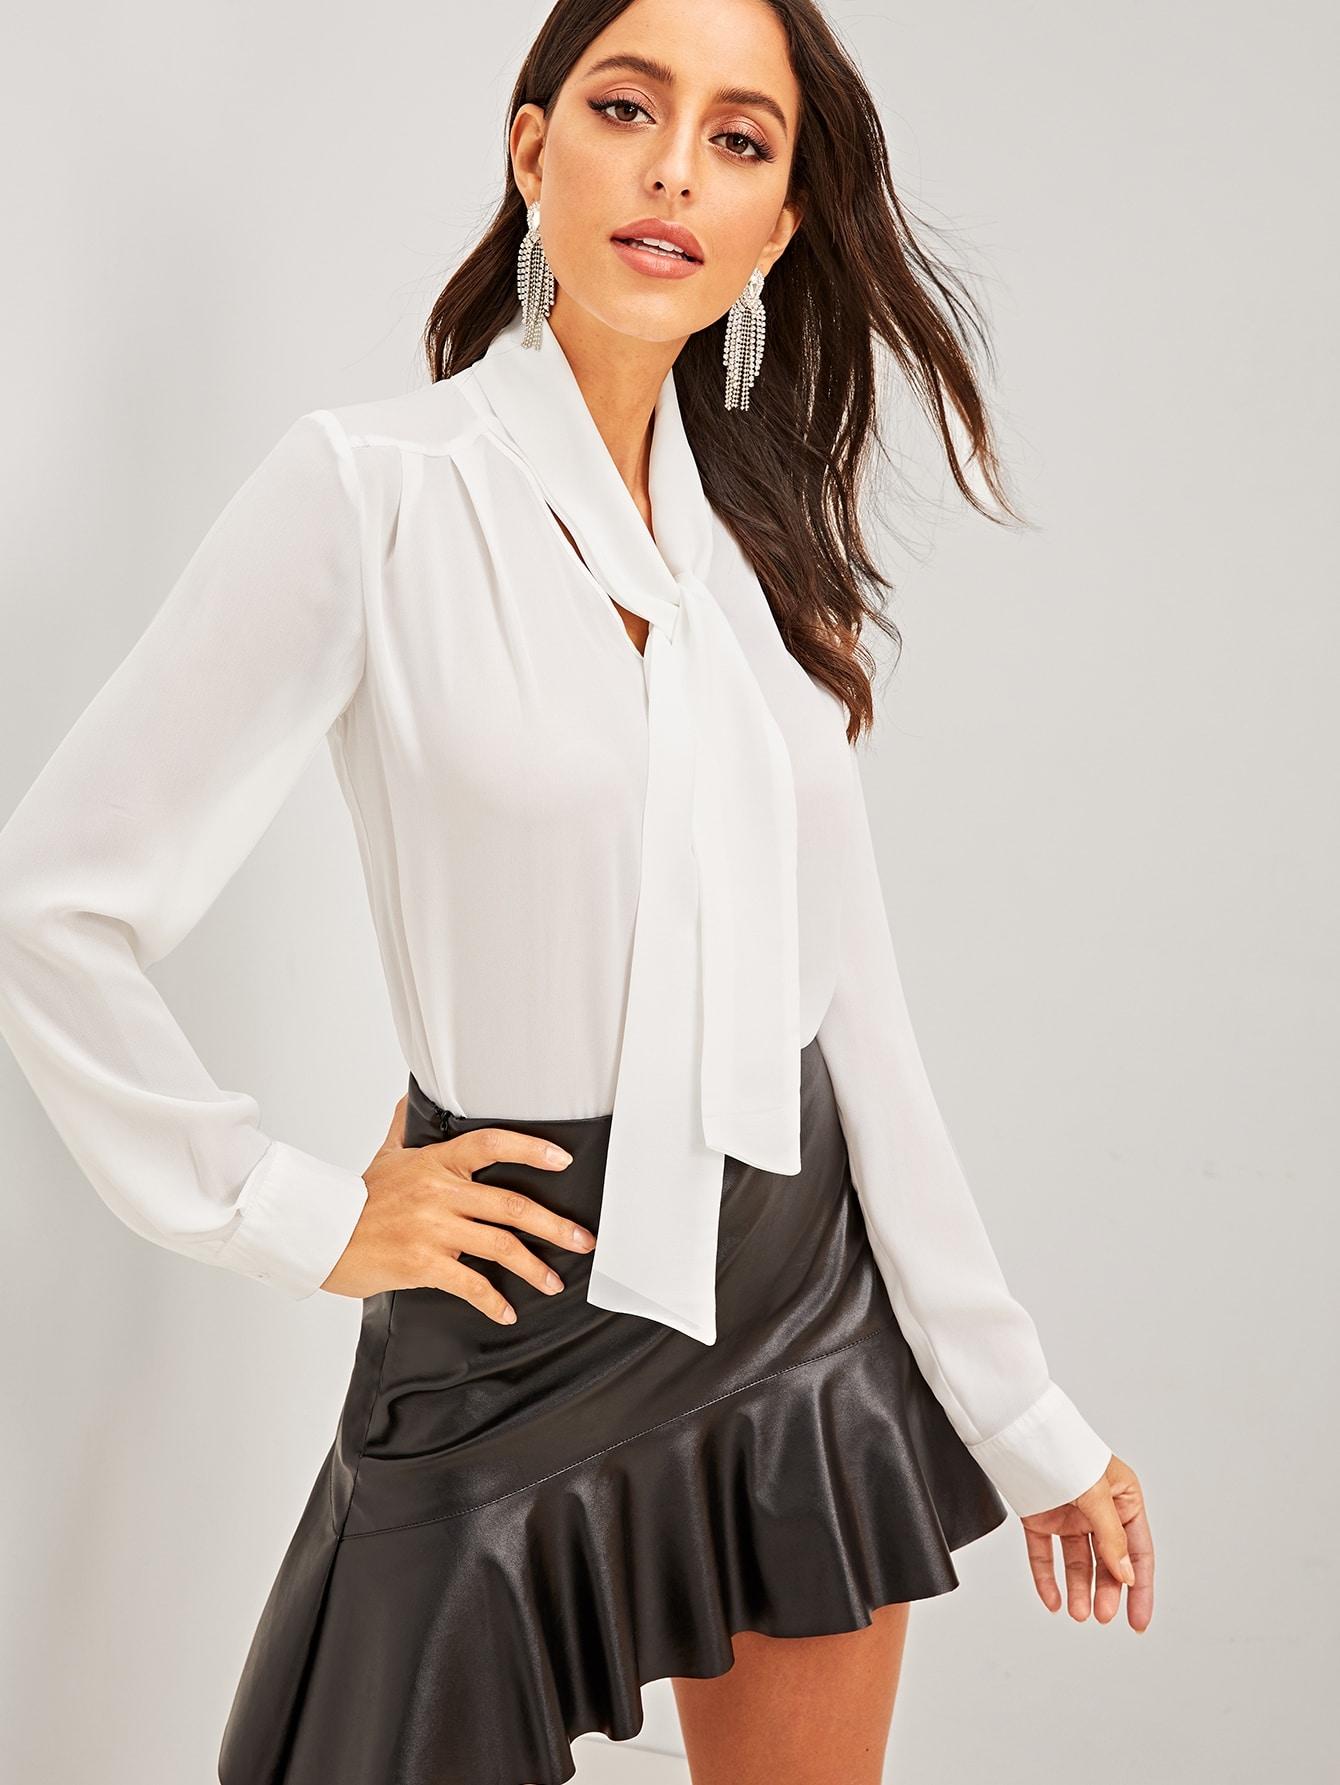 Купить Однотонная блуза с завязкой на шее, Mary P., SheIn